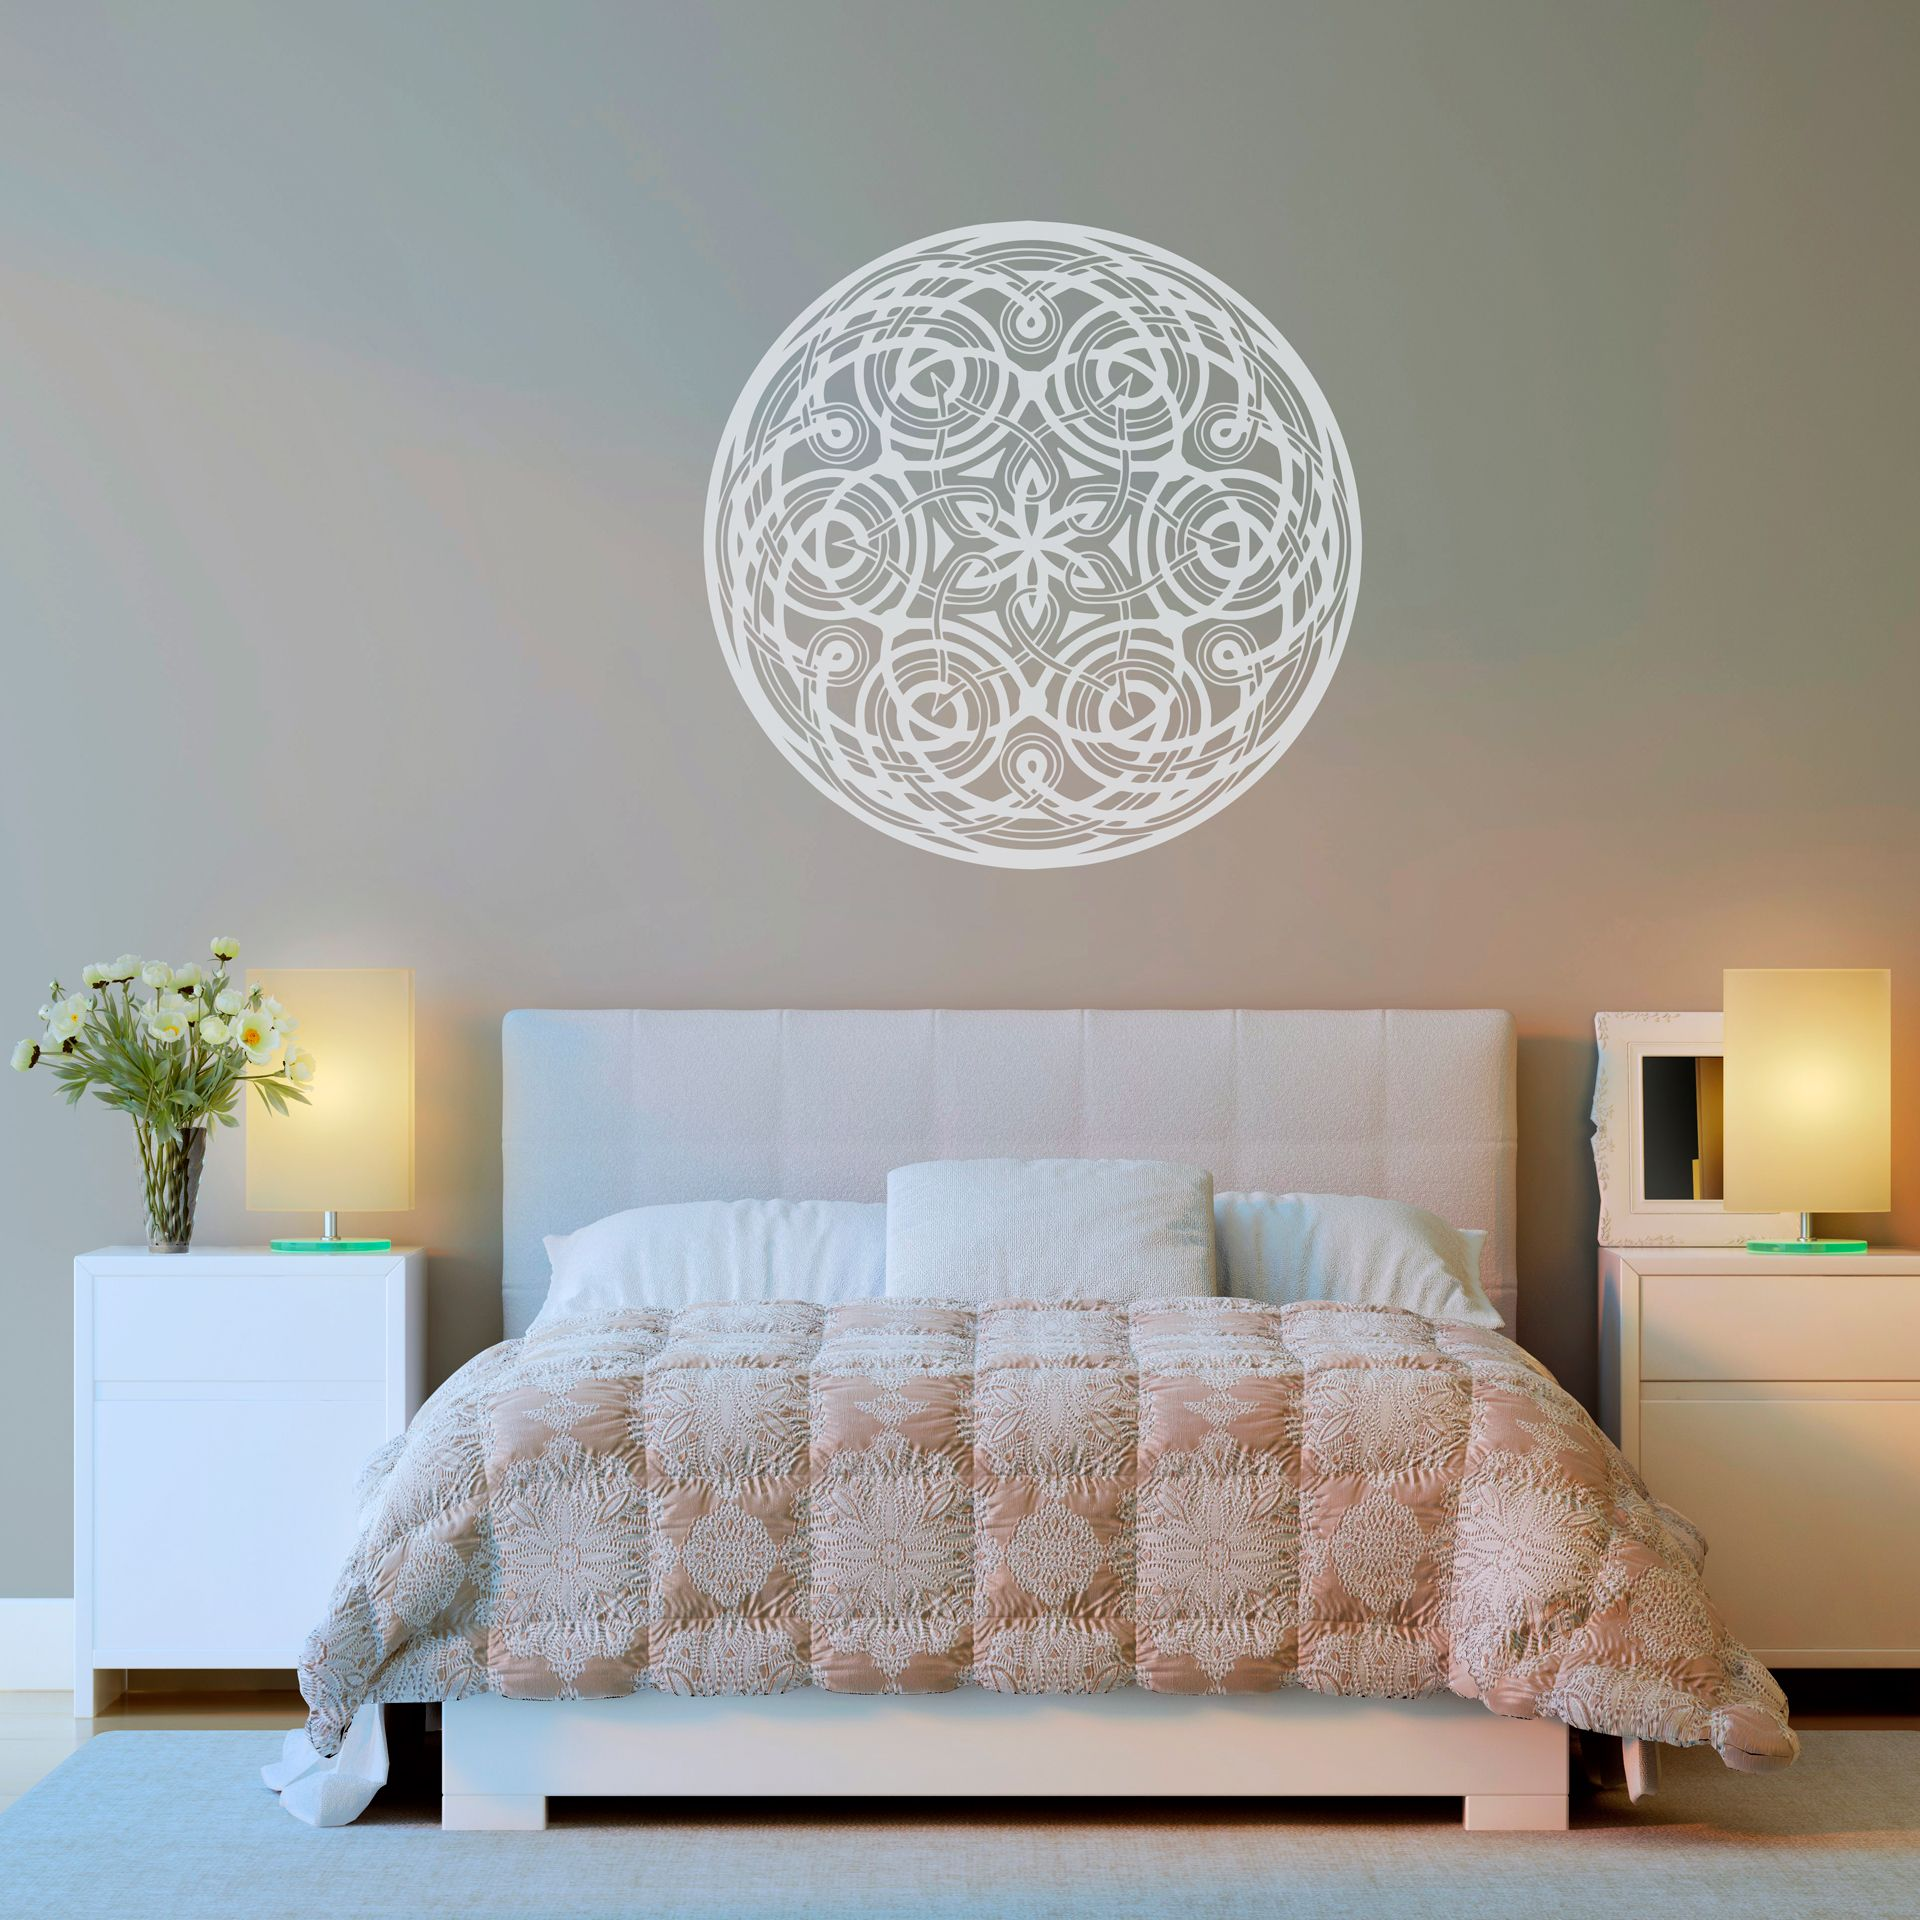 Vinilo decorativo mandala floral encu ntralo en www - Mandalas para pared ...